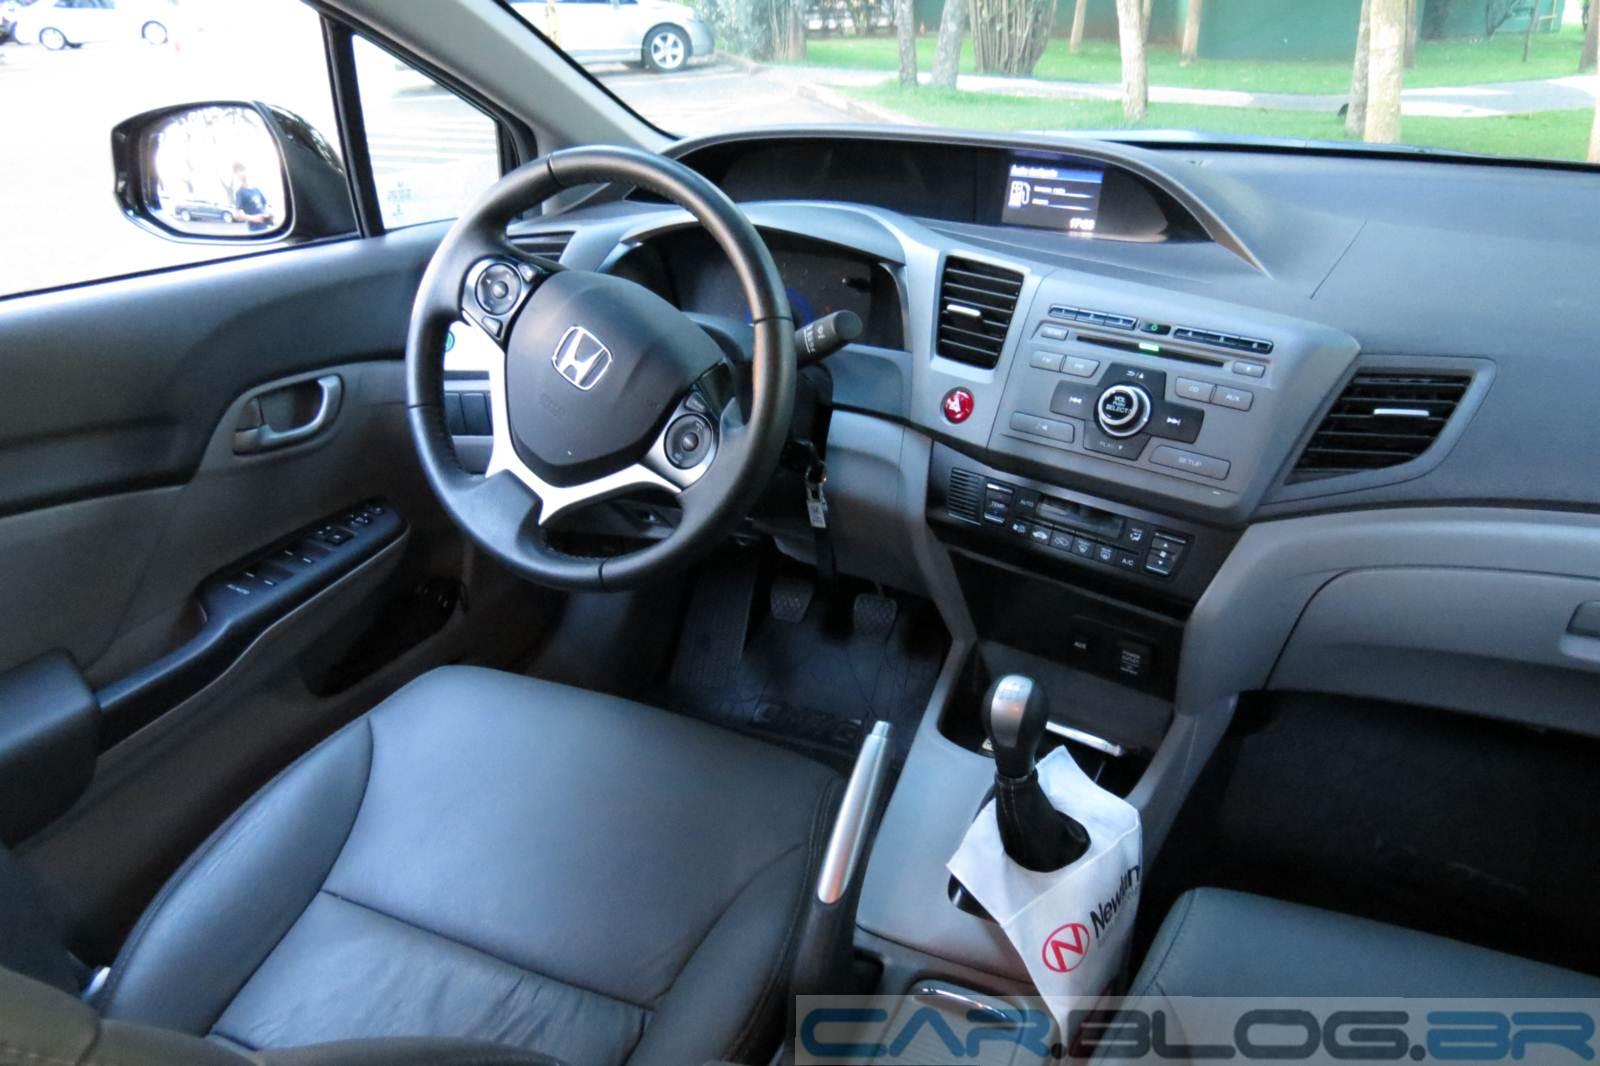 Honda Civic LXS 2012 Manual - interior